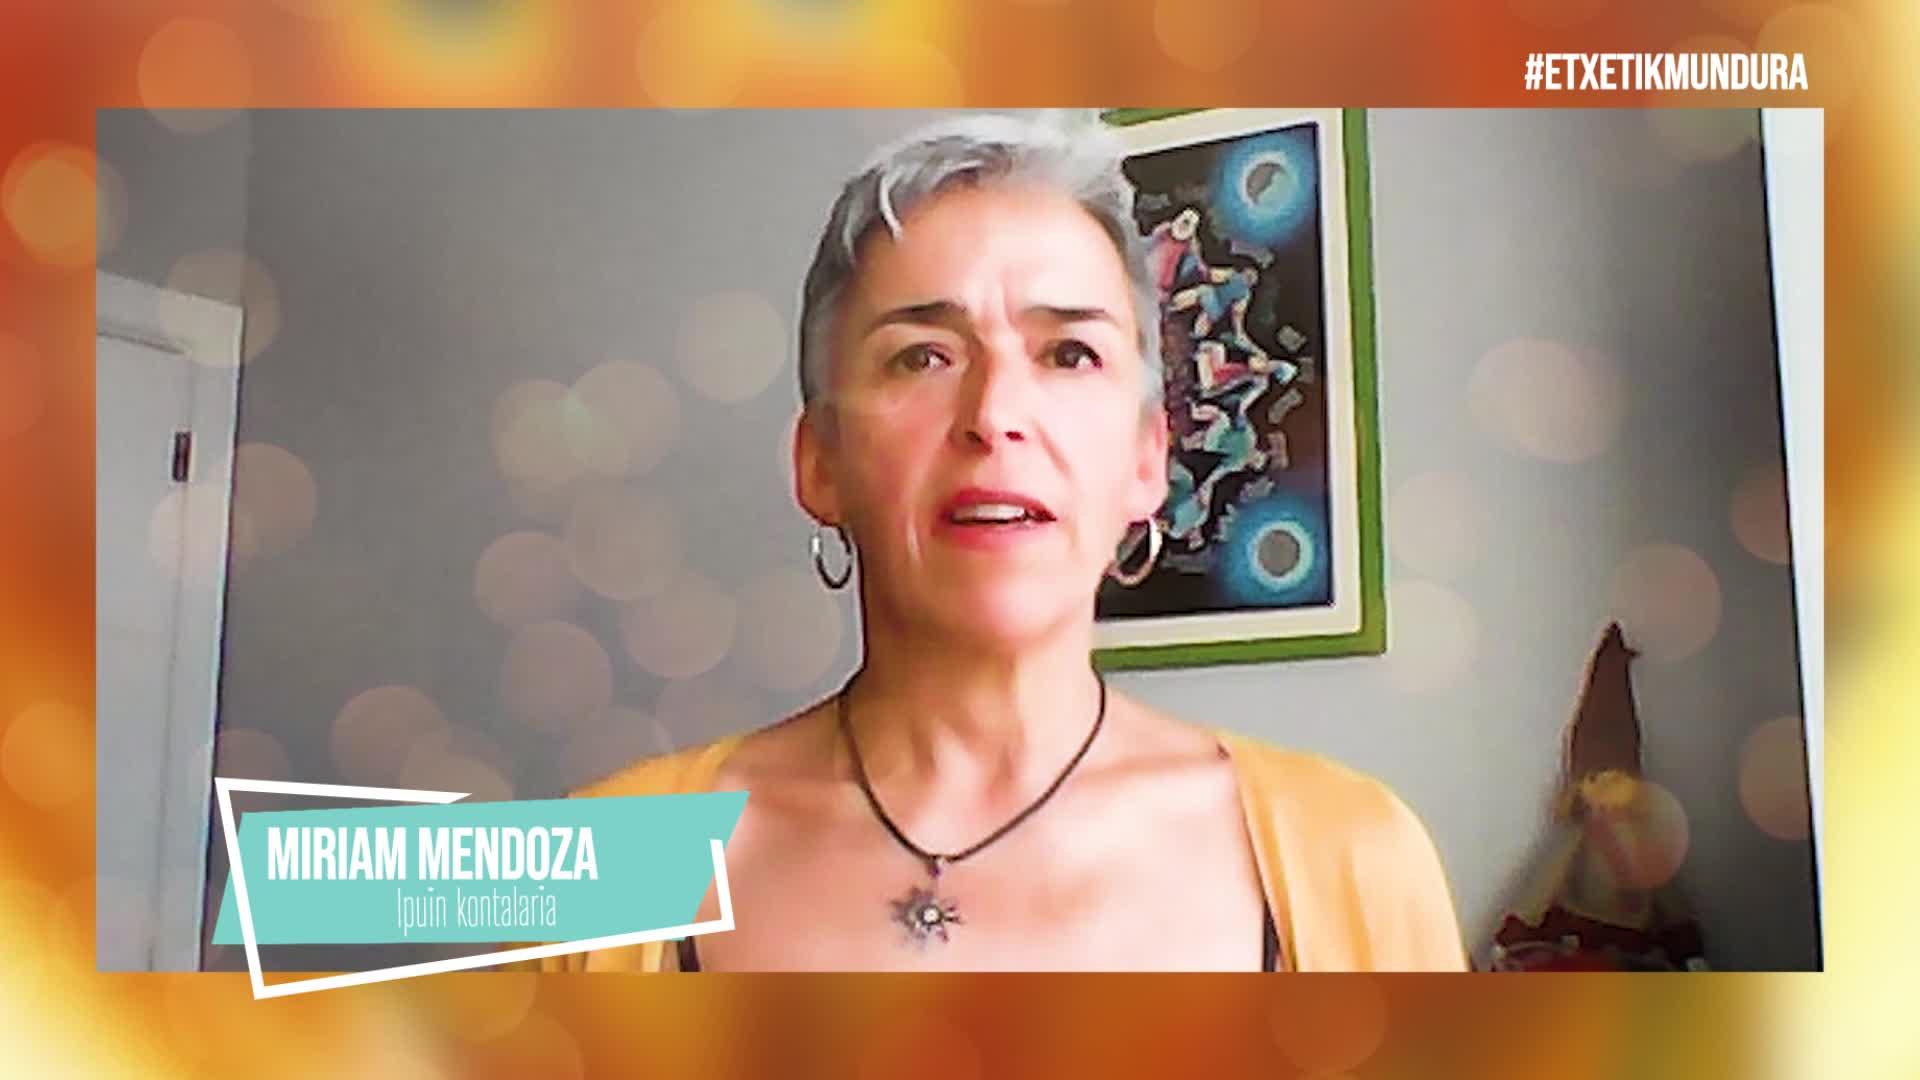 Miriam Mendoza ipuin kontalaria, etxetik mundura